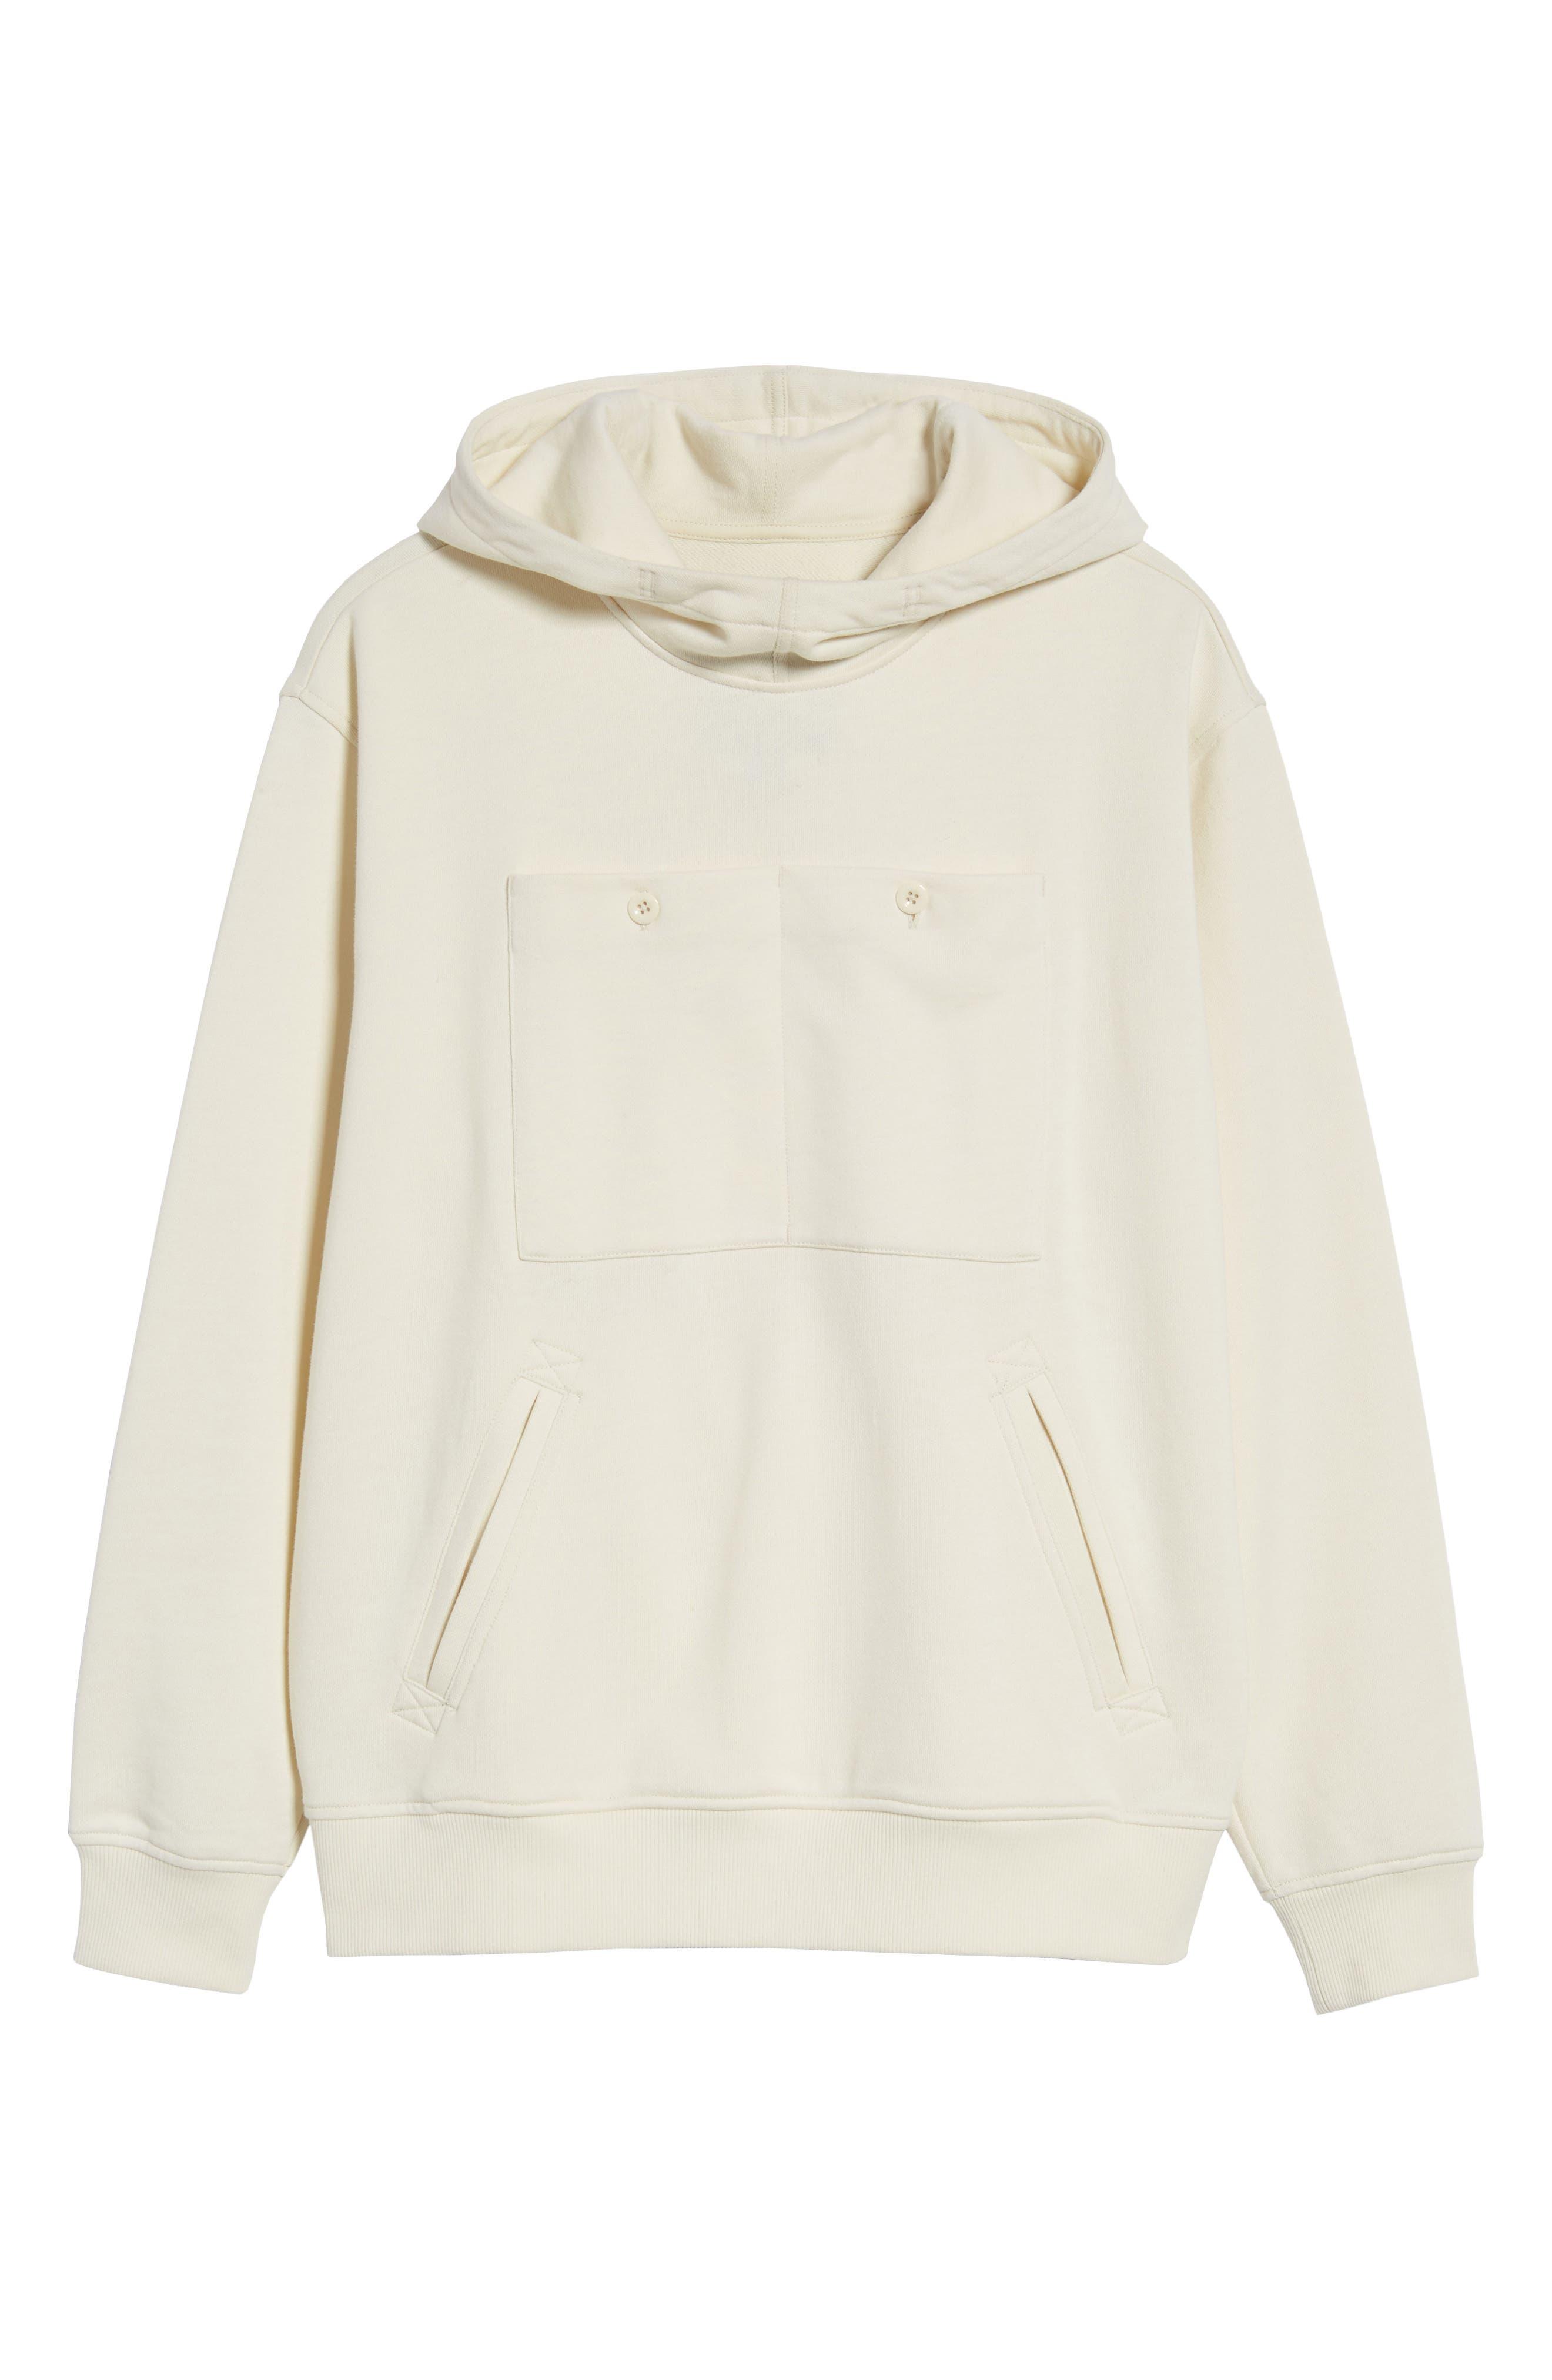 Core Hybrid Archive Hooded Sweatshirt,                             Alternate thumbnail 6, color,                             Ivory